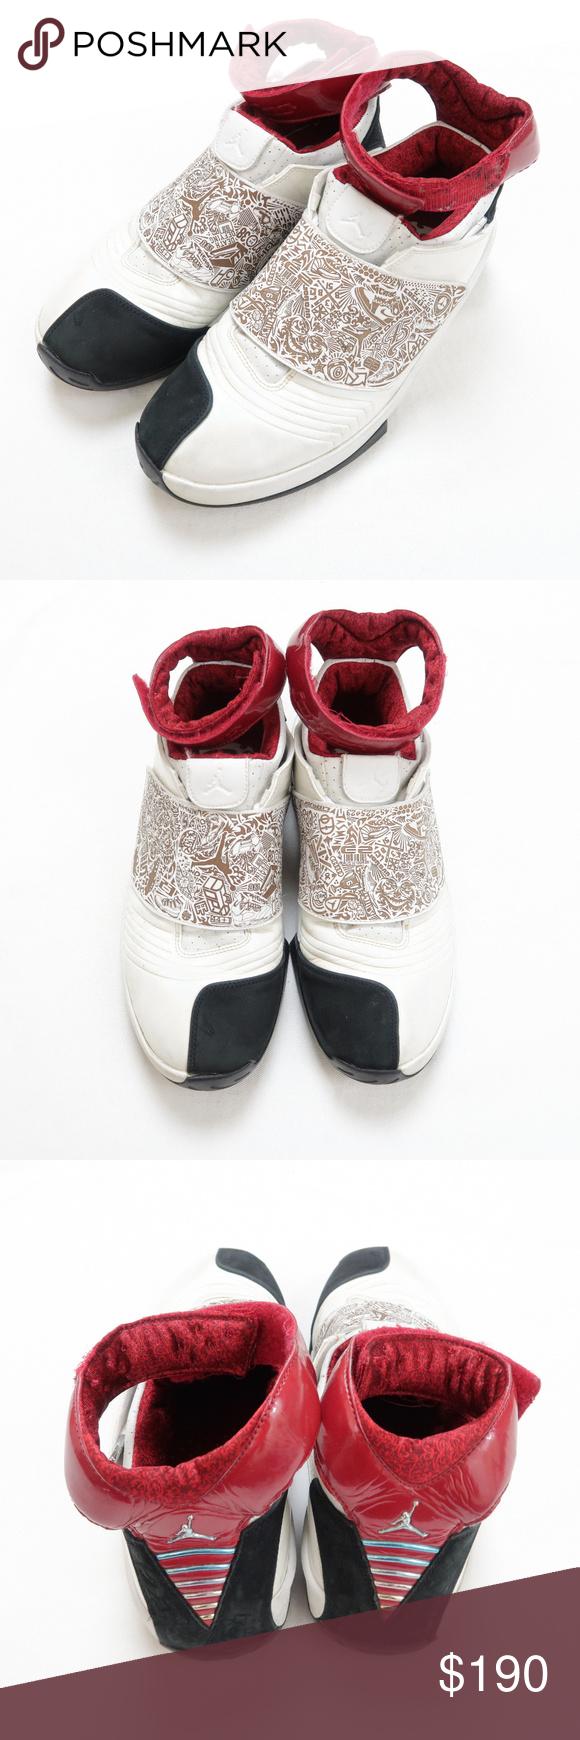 online store 7b61b 3aac0 Air Jordan 20 White Varsity Red Black XX Size 10.5 Nike Air Jordan 20 shoes  from